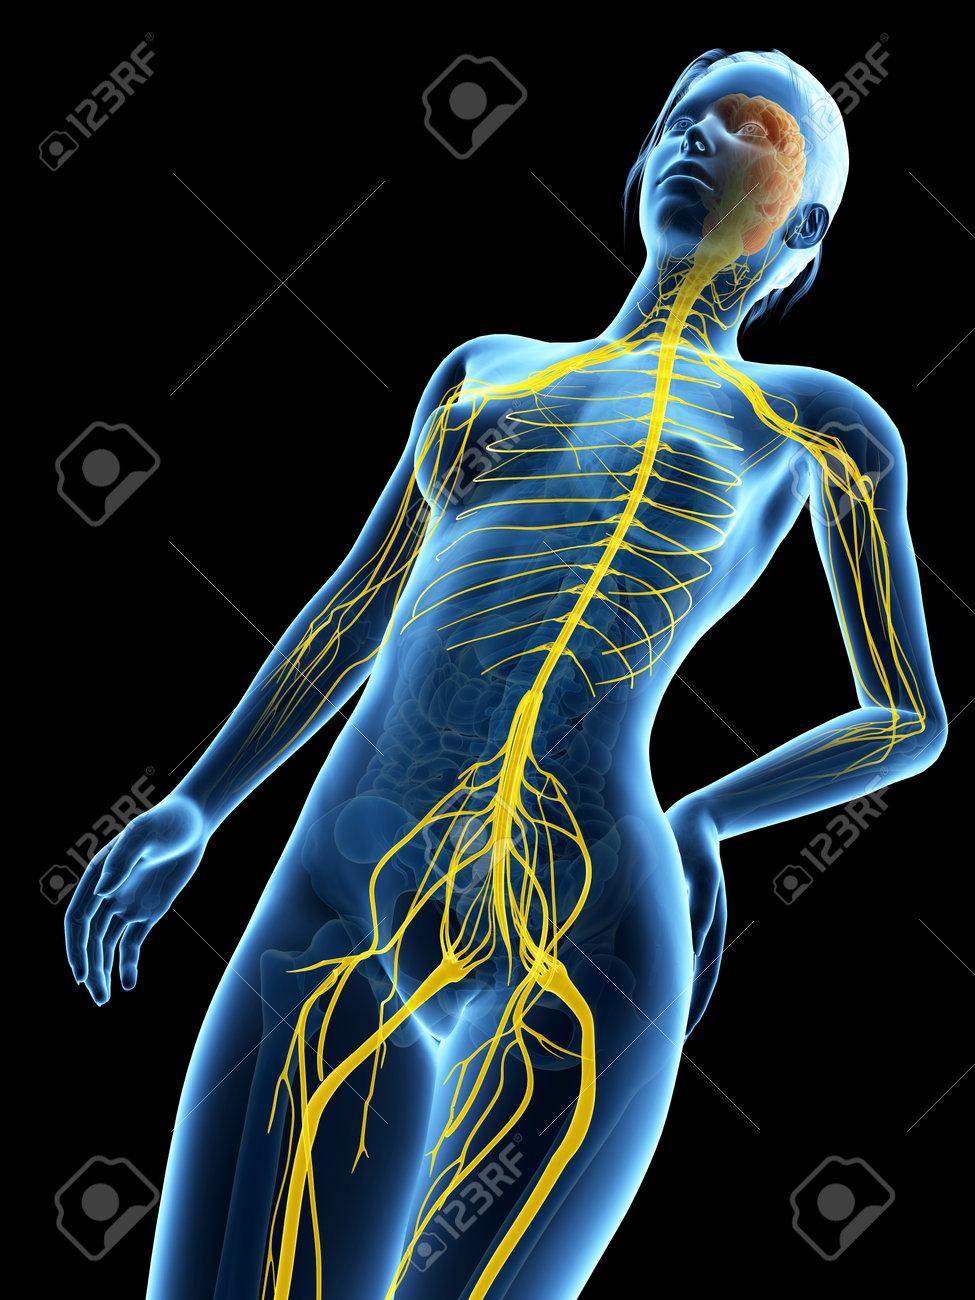 Medical 3d Illustration Female Anatomy Nervous System Stock